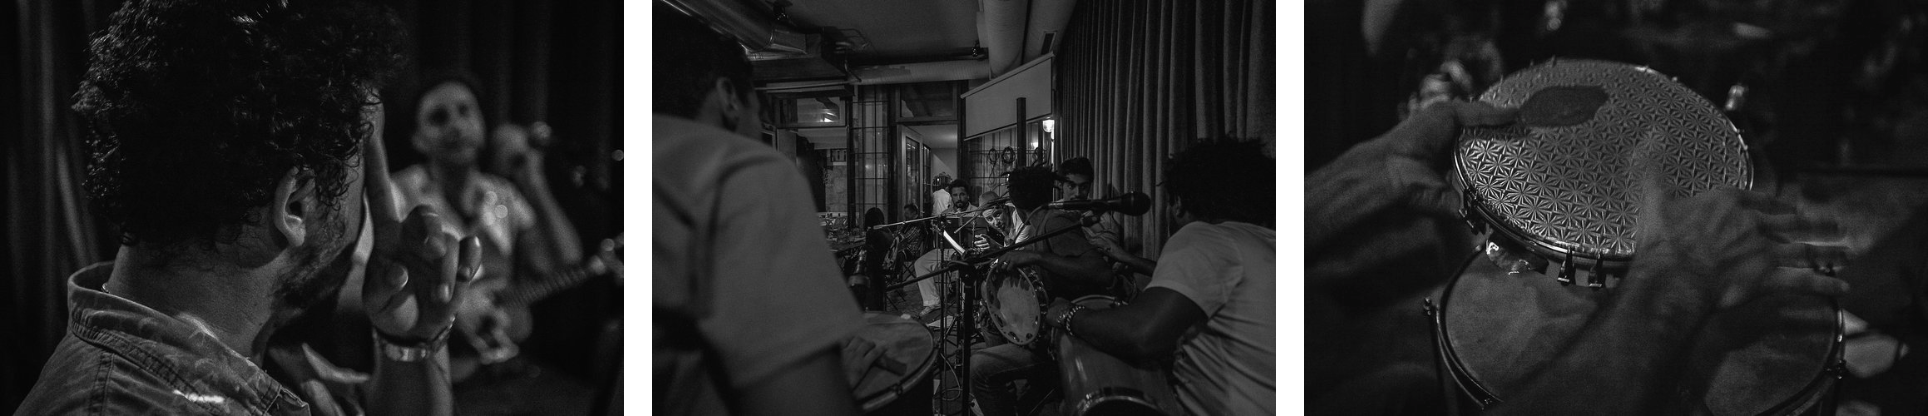 Quintal do Samba bonjourmolotov Andre Gigante Photography 03.png